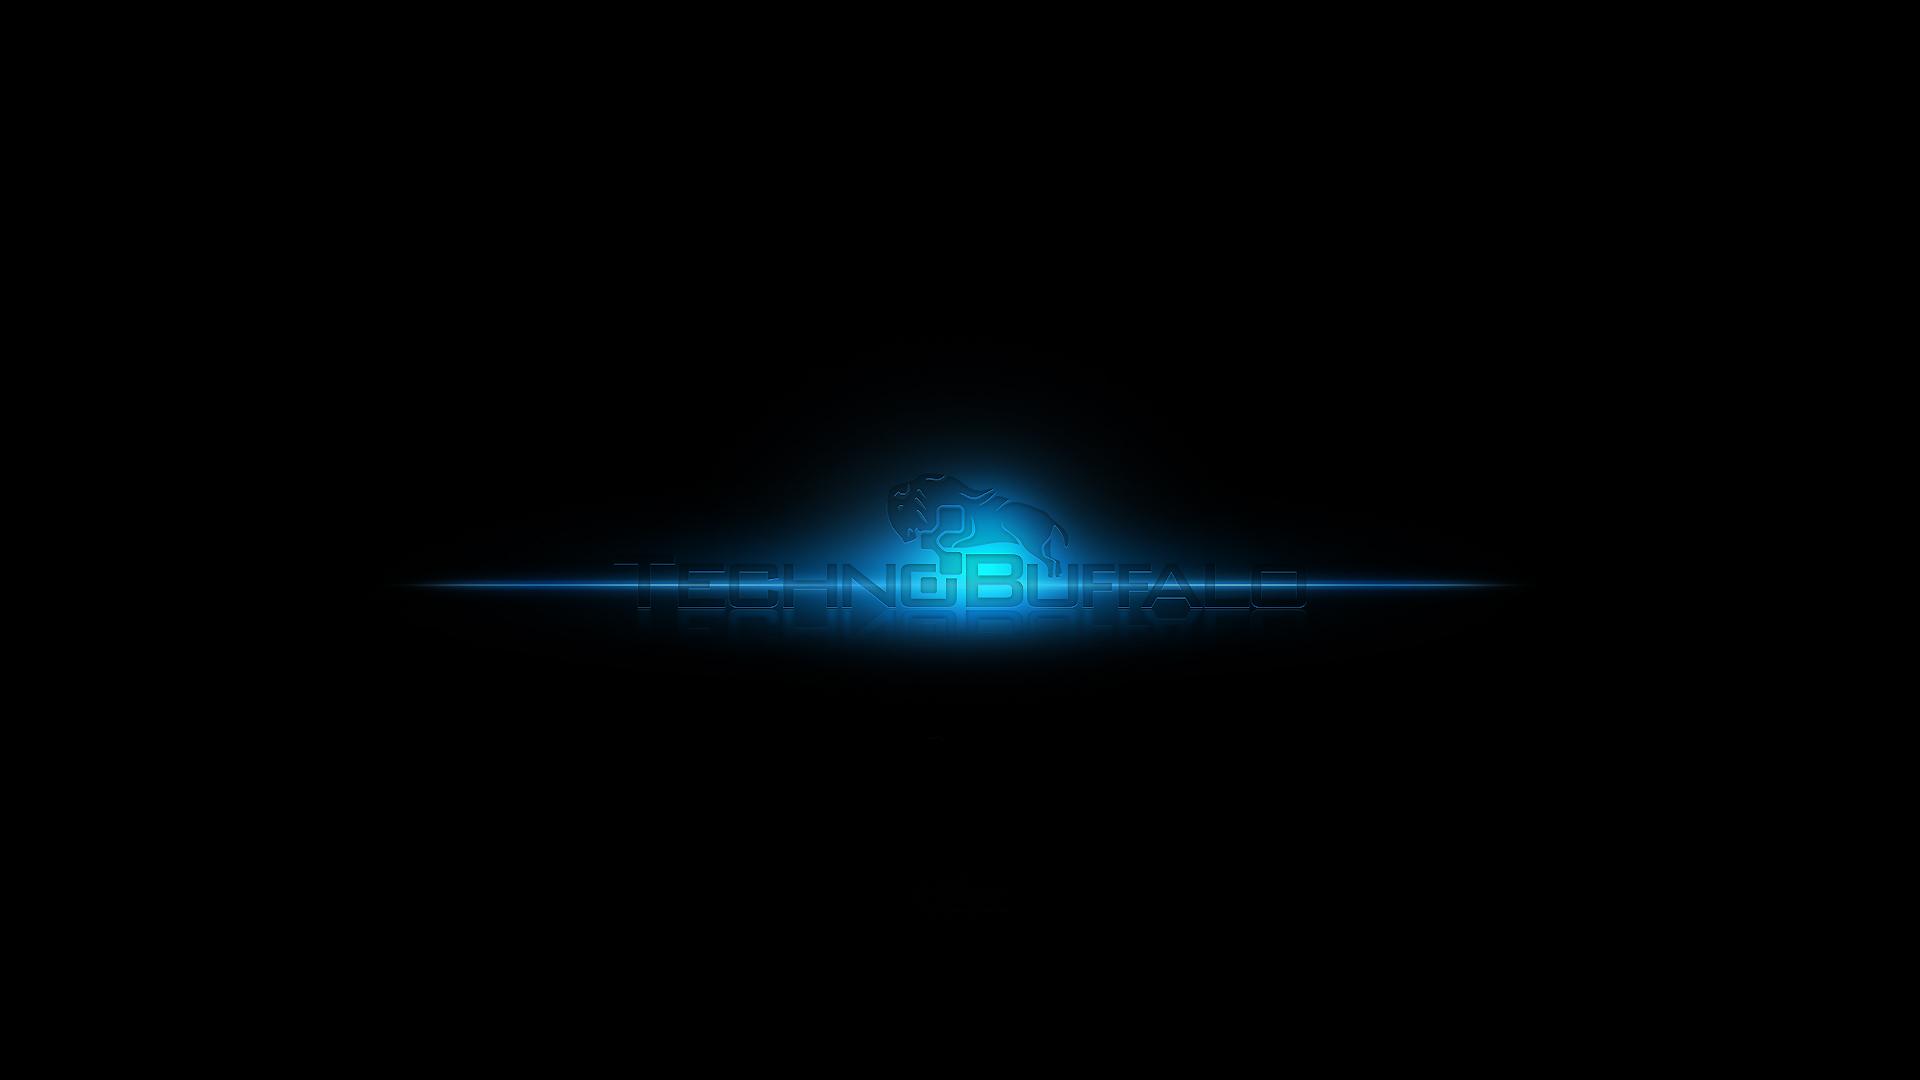 Glow Technobuffalo Wallpaper 1920x1080